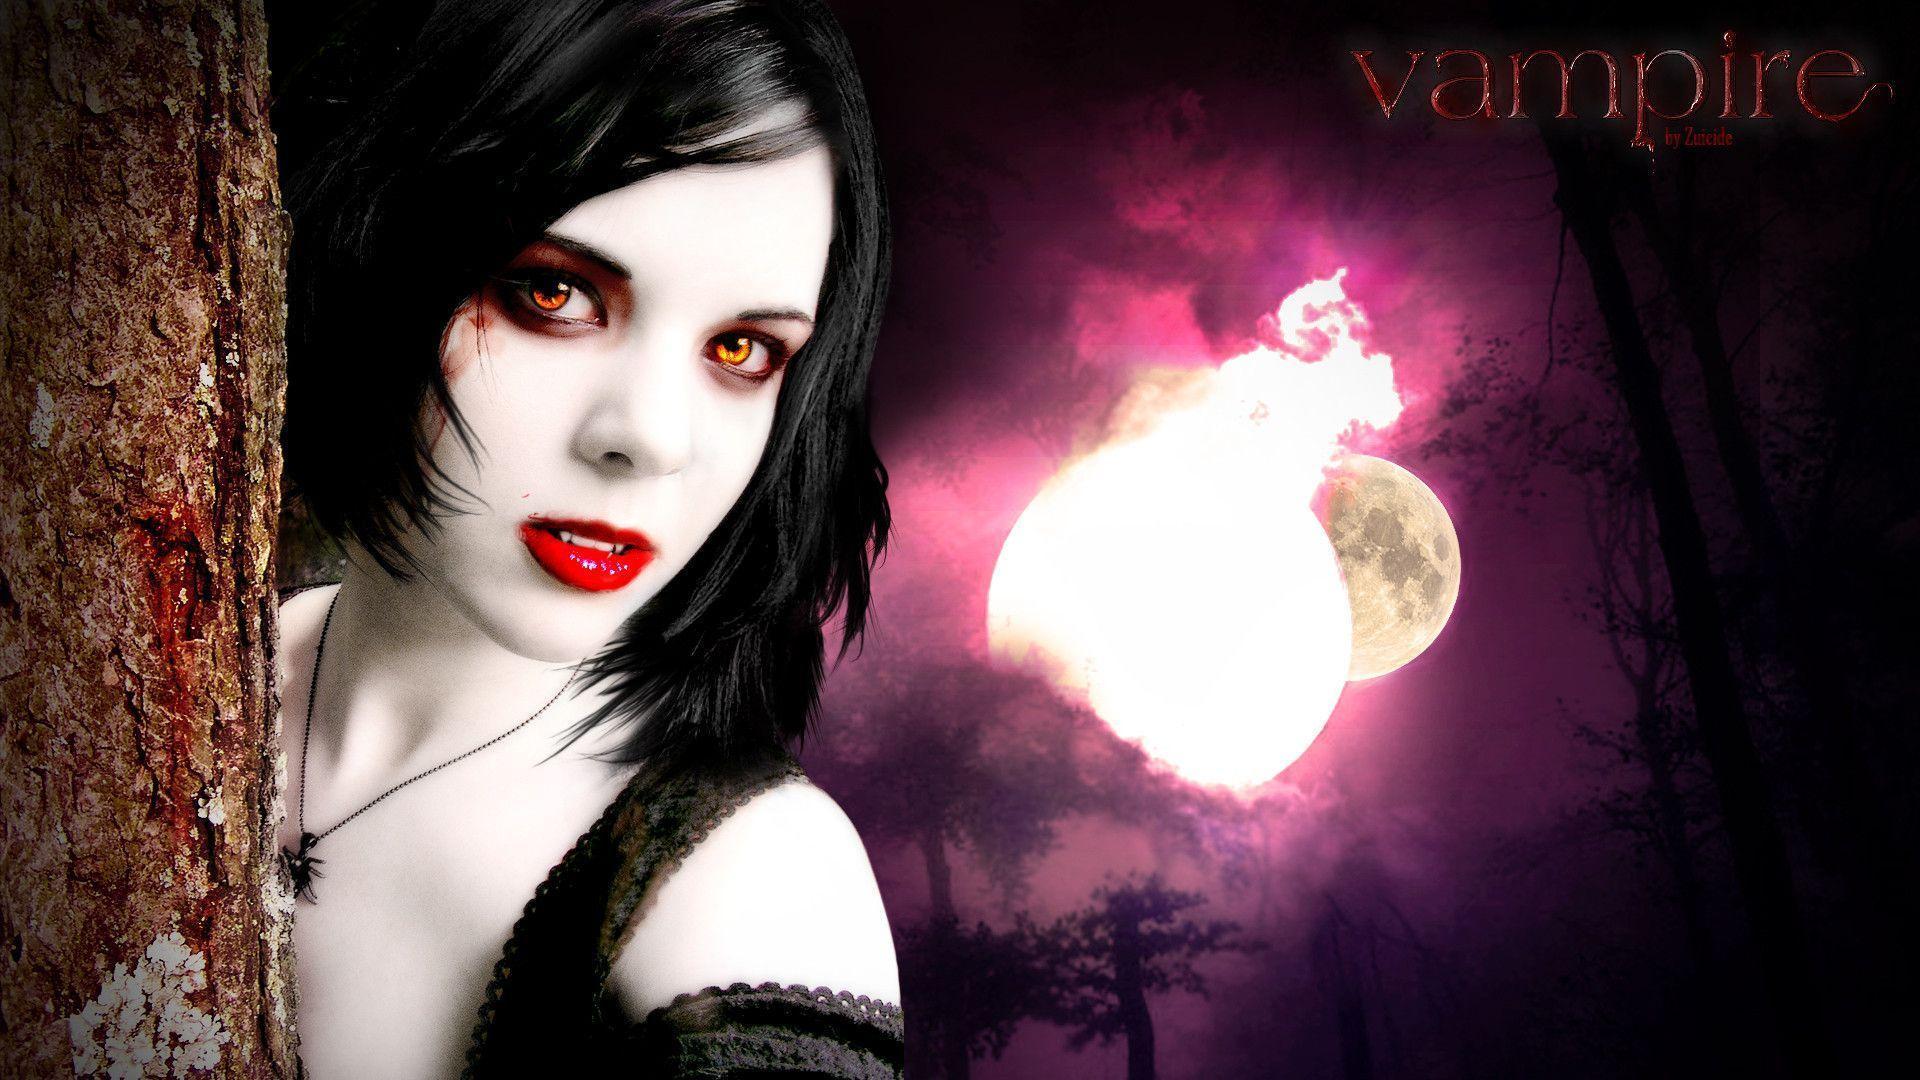 Vampire Wallpapers Free